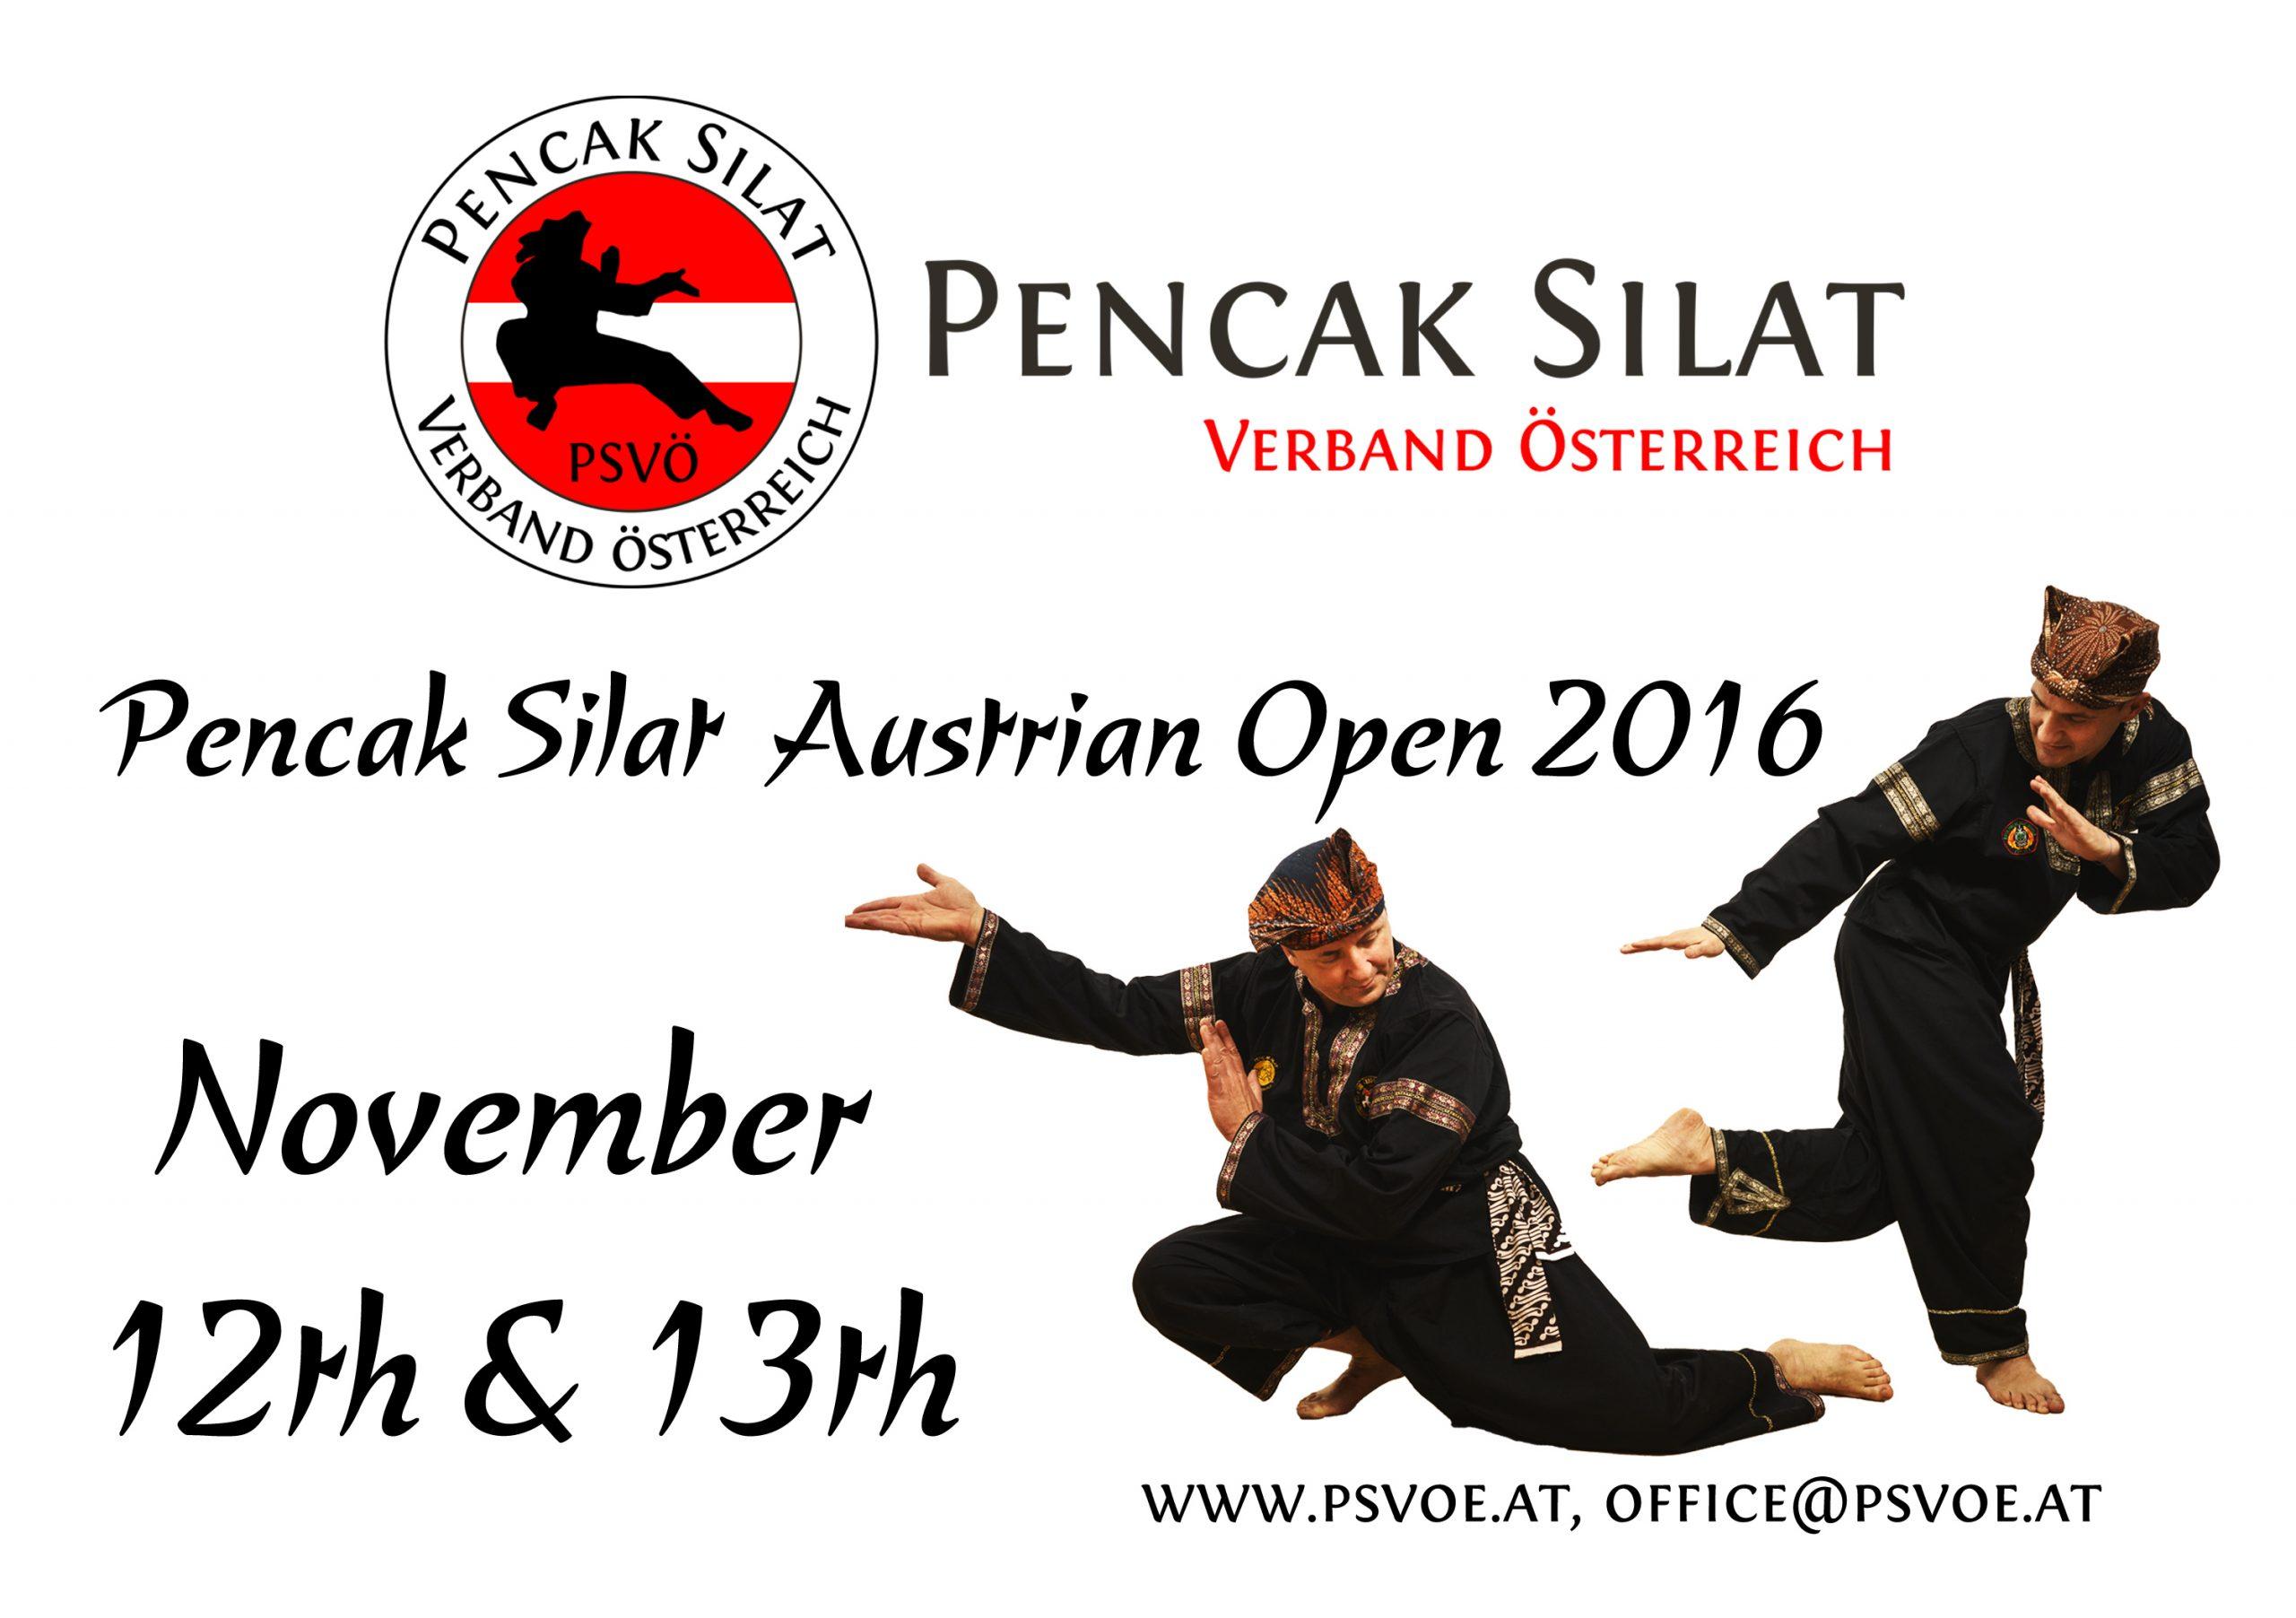 Austrian Open 2016